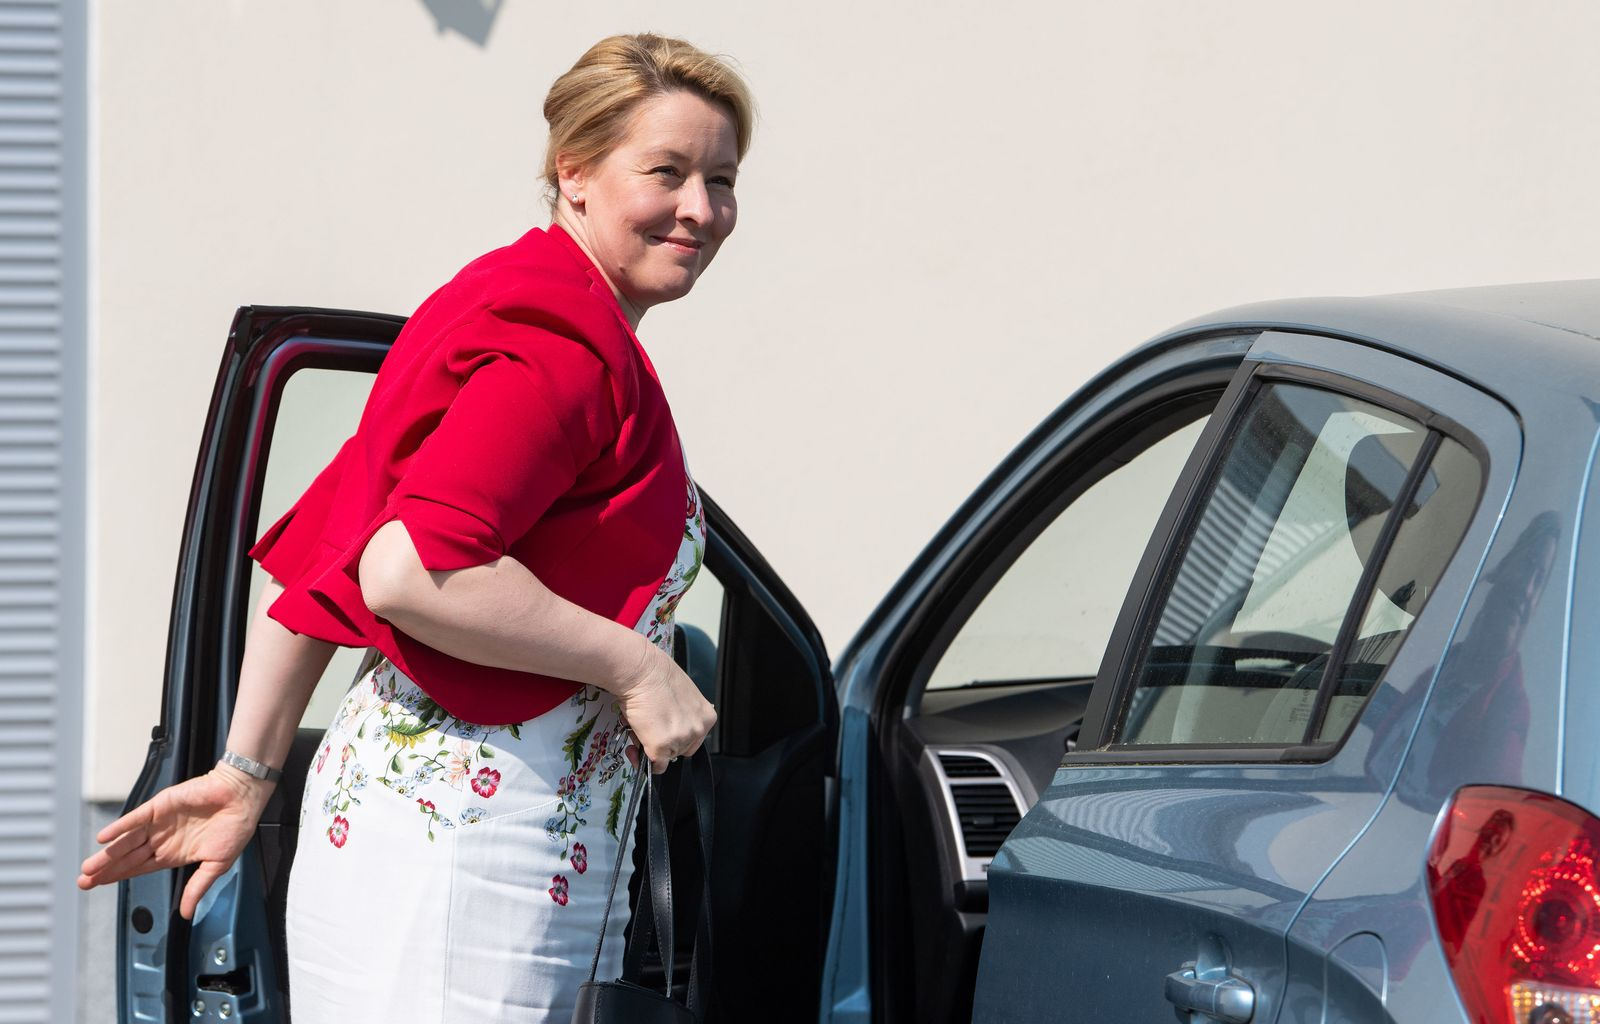 Franziska Giffey im Wahlkampf - Taxi Zentrum Berlin